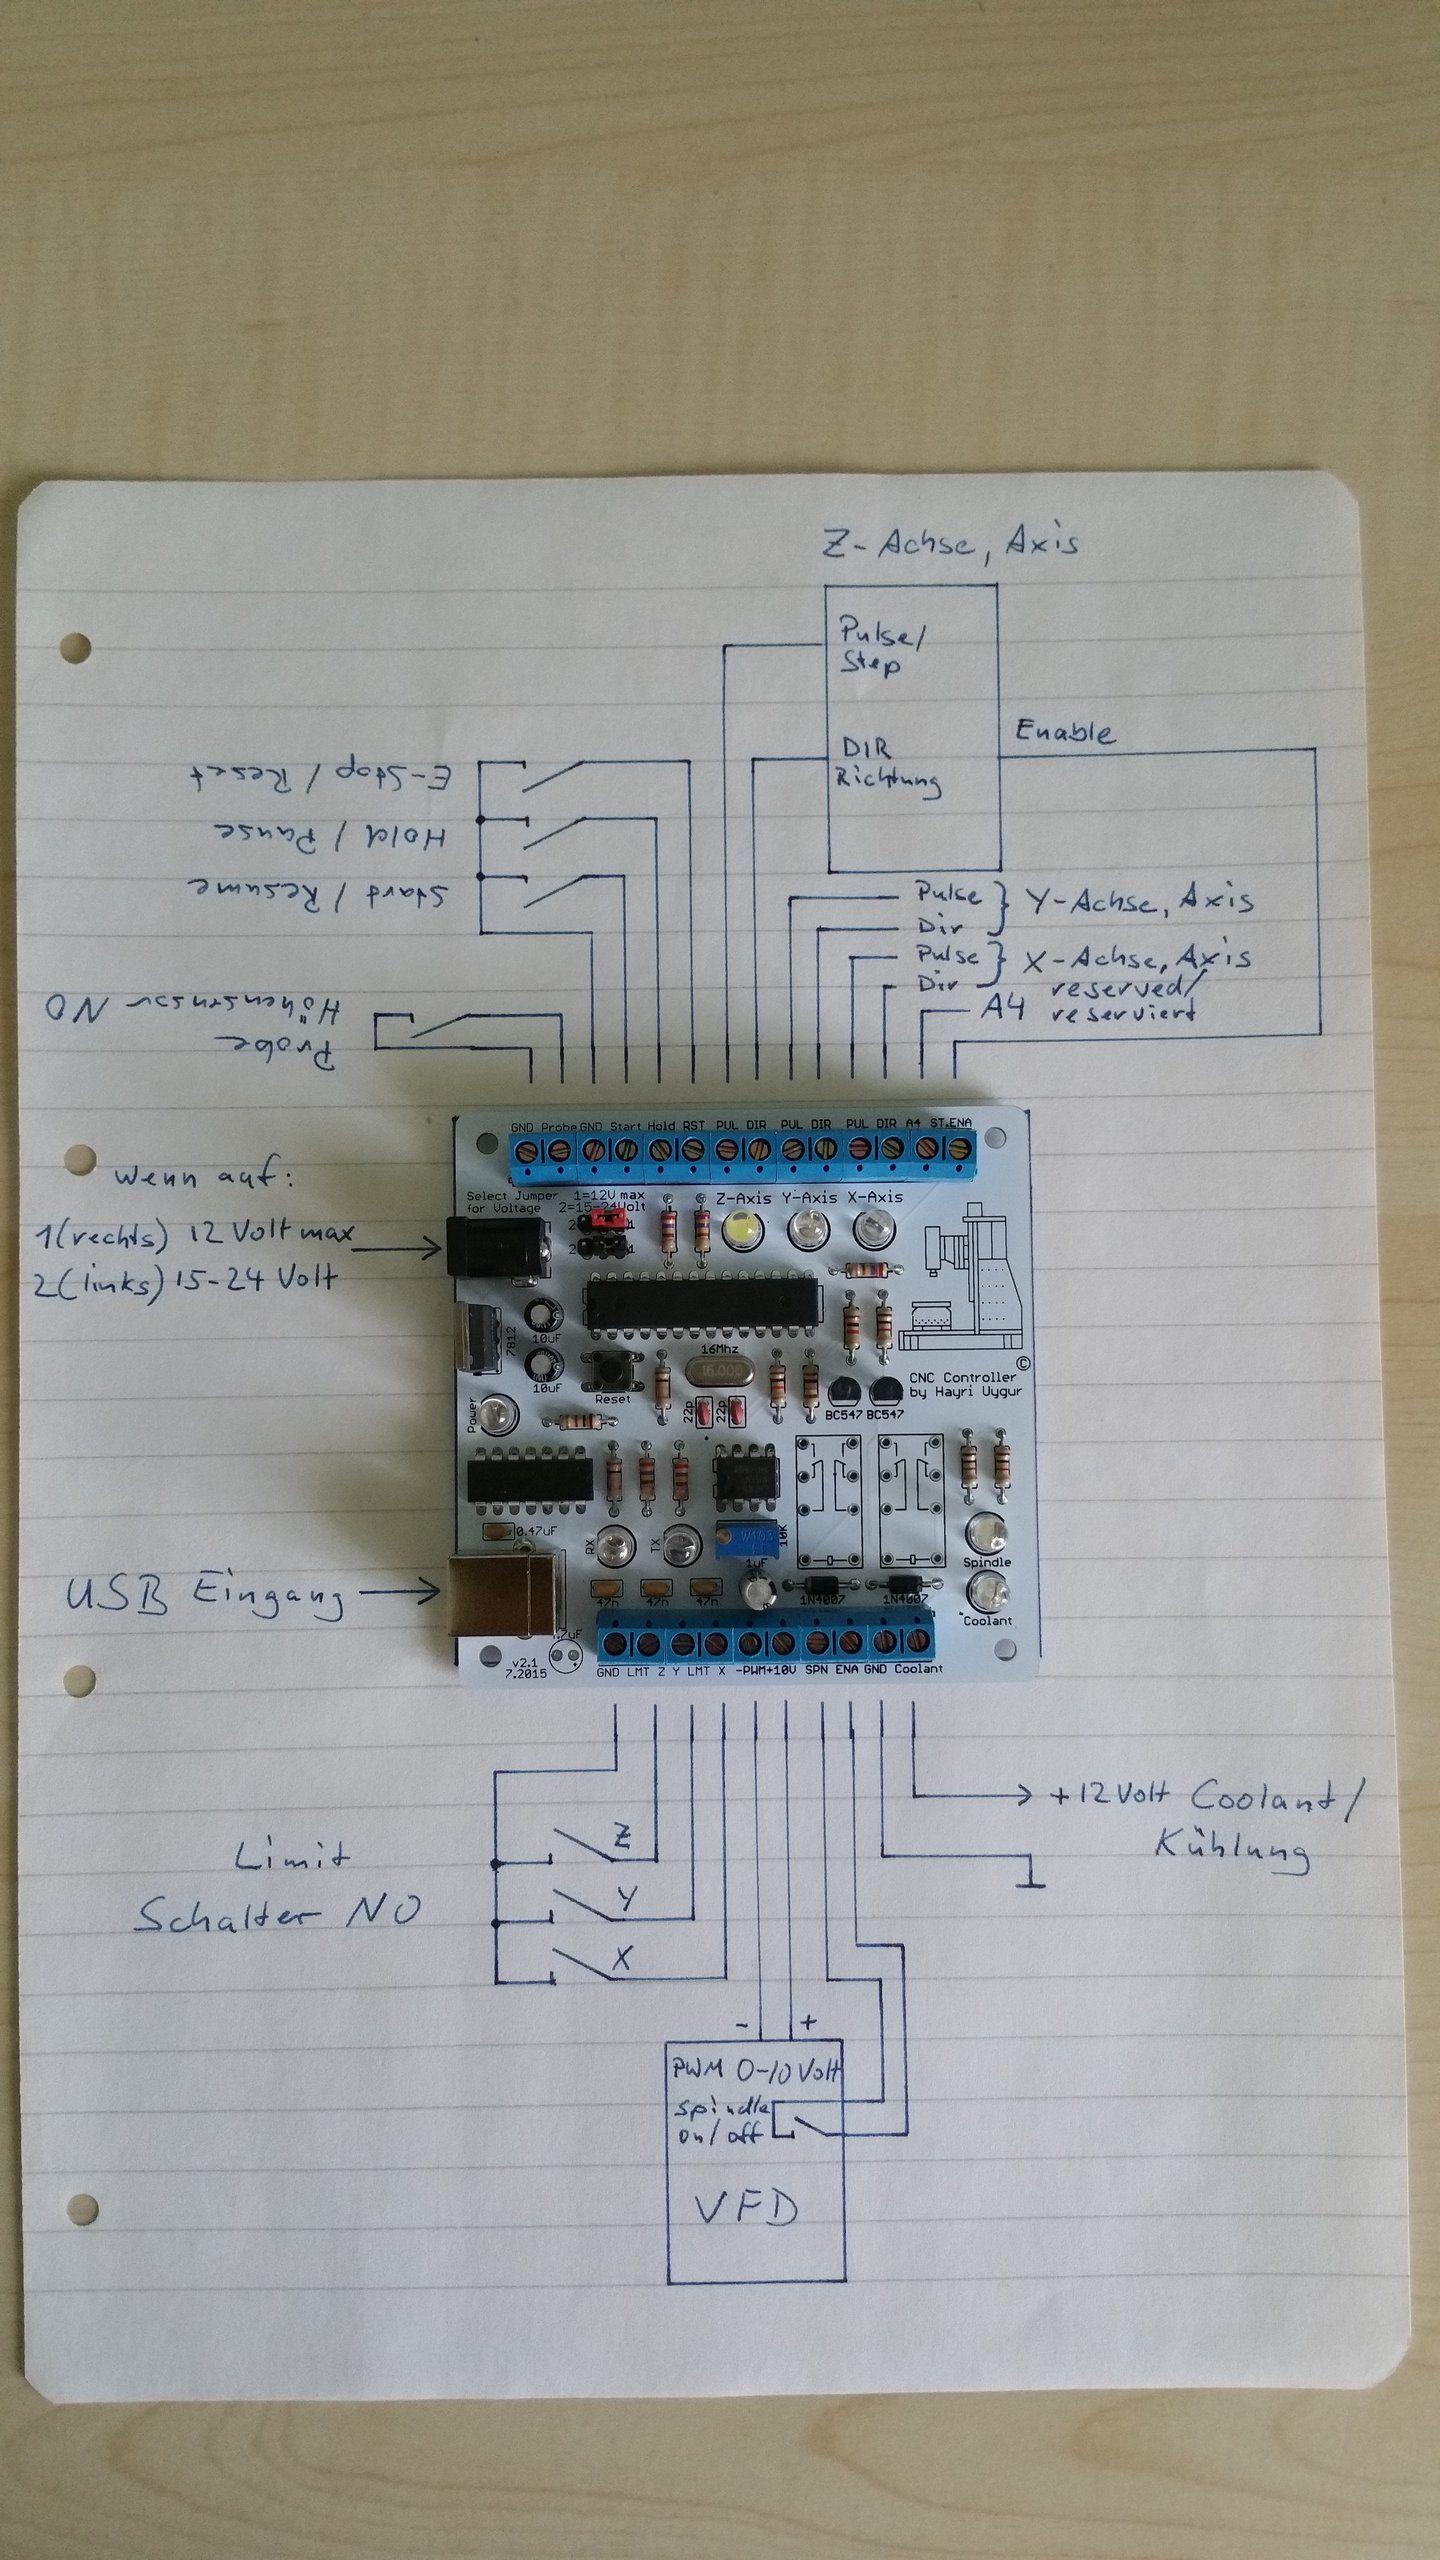 phoenix usb cnc controller with pwm output [ 1440 x 2560 Pixel ]